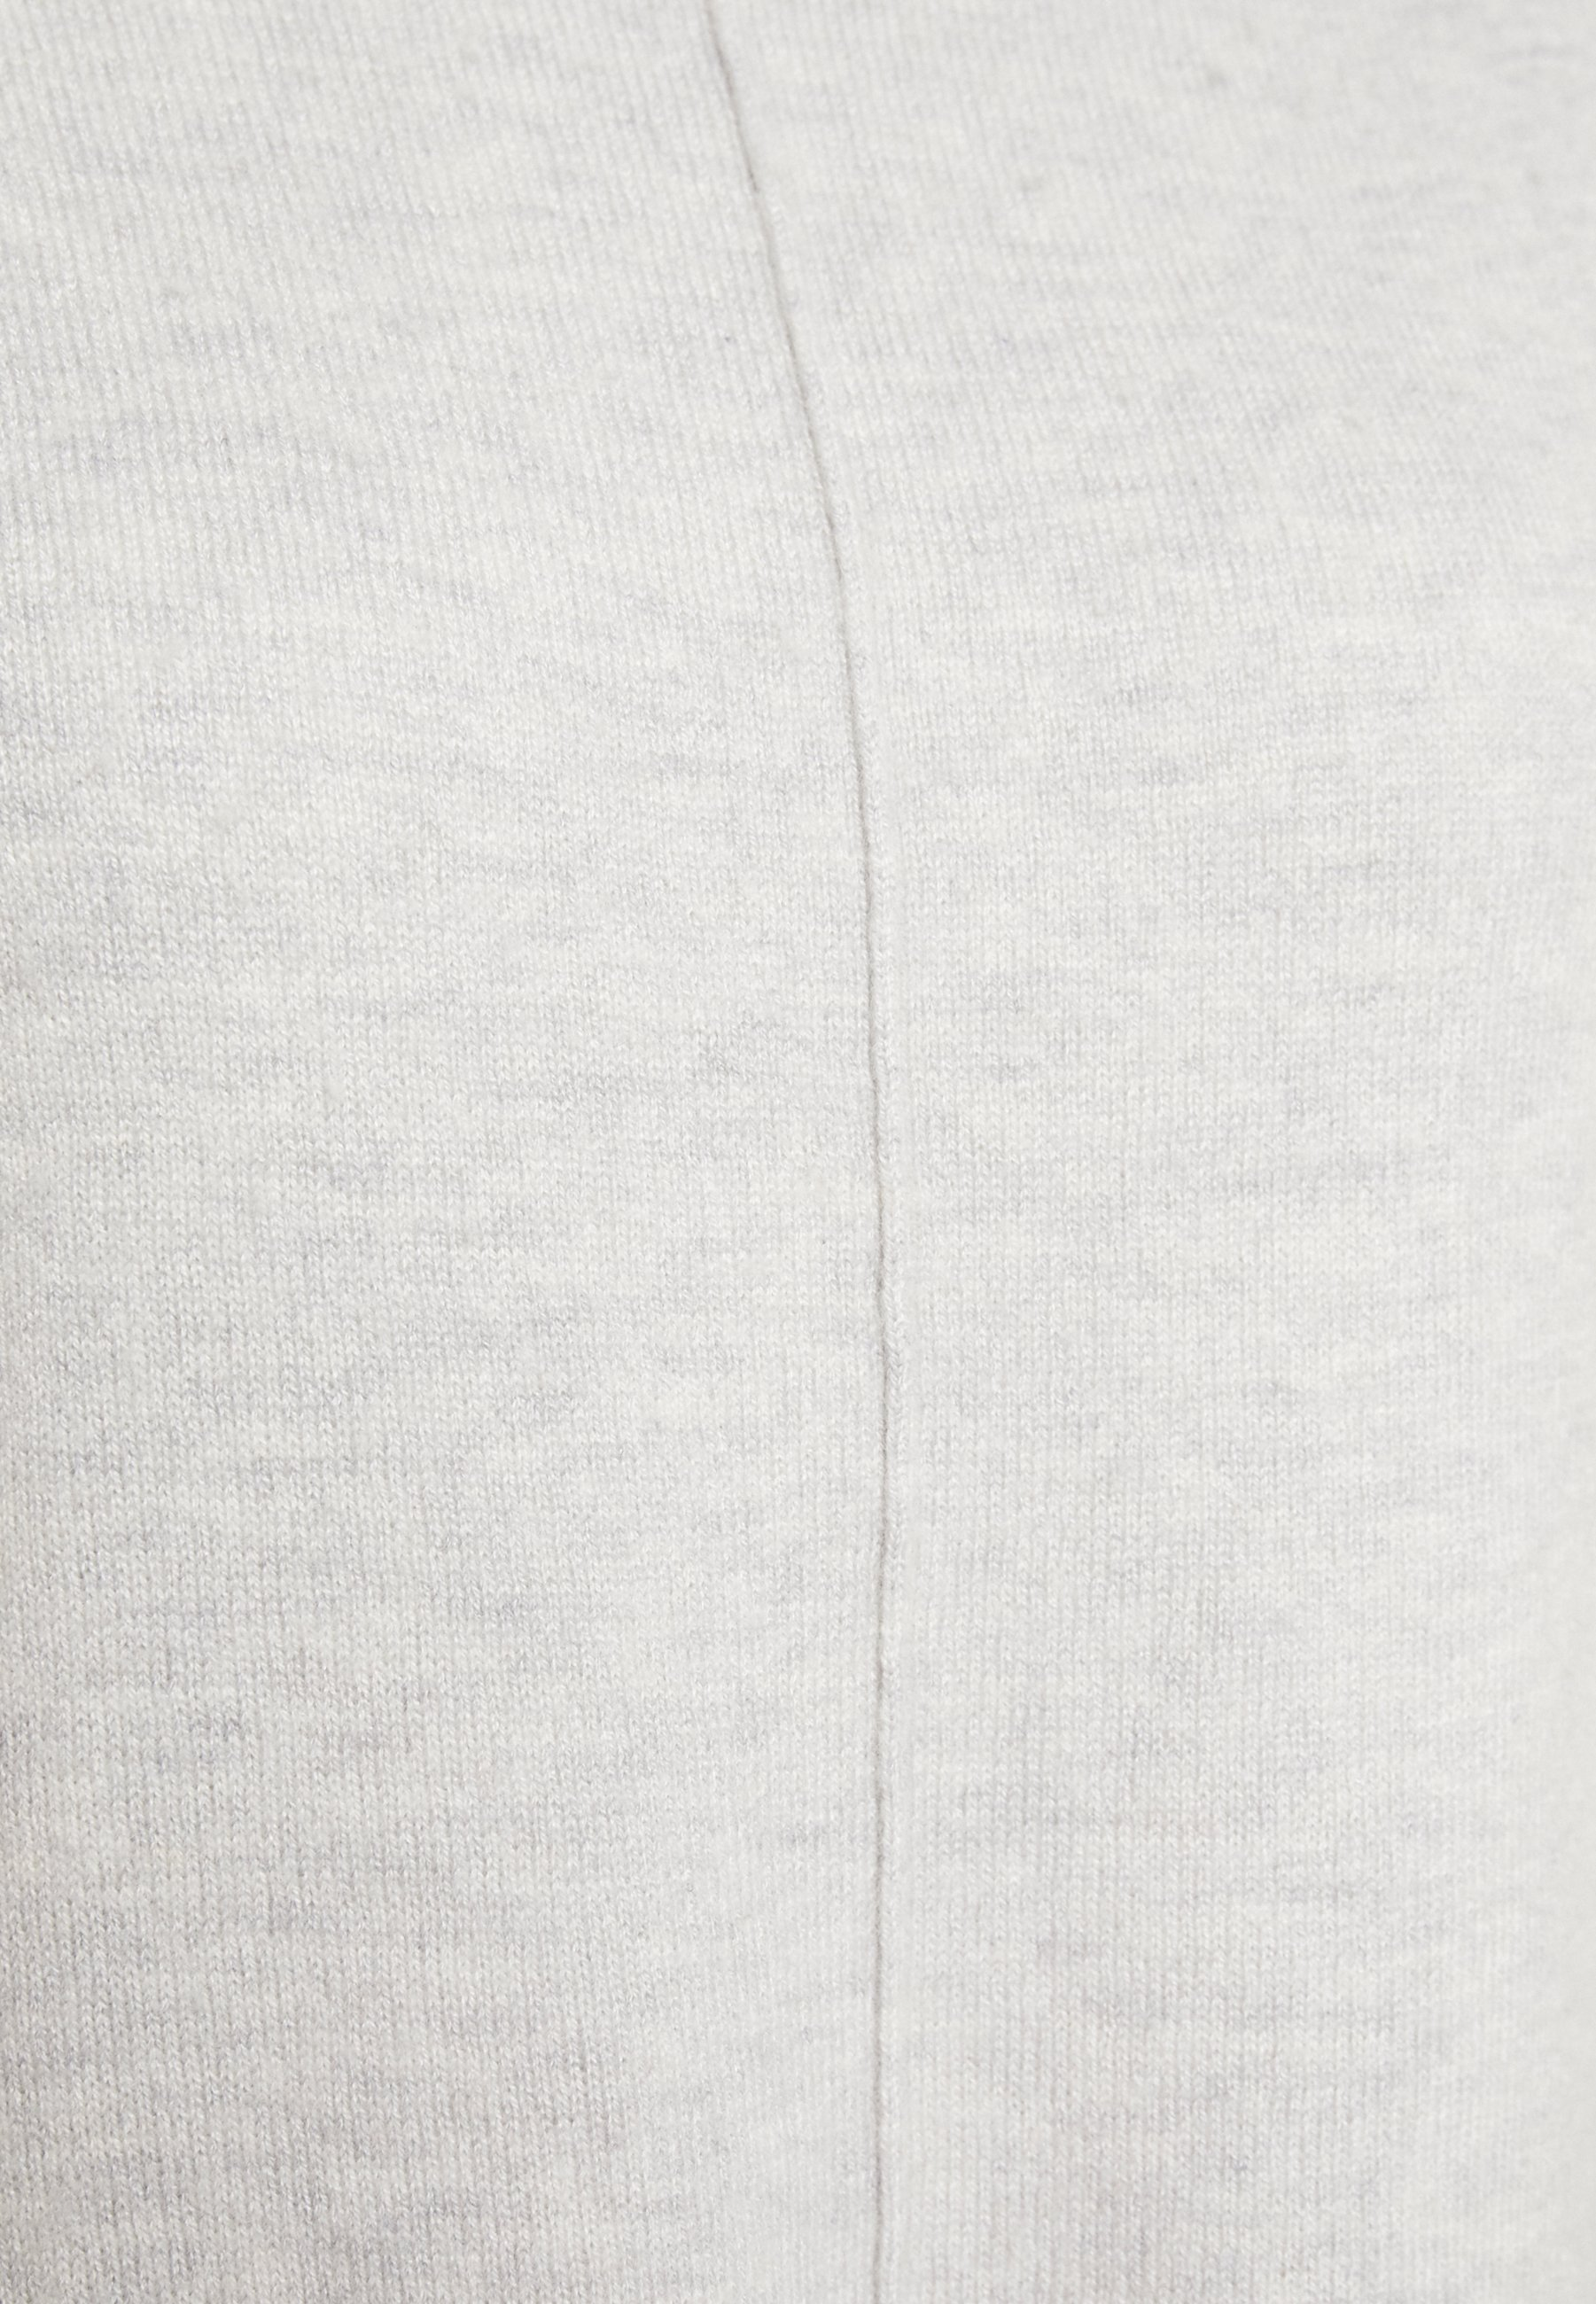 Superdry Bria Raglan - Jumper Grey